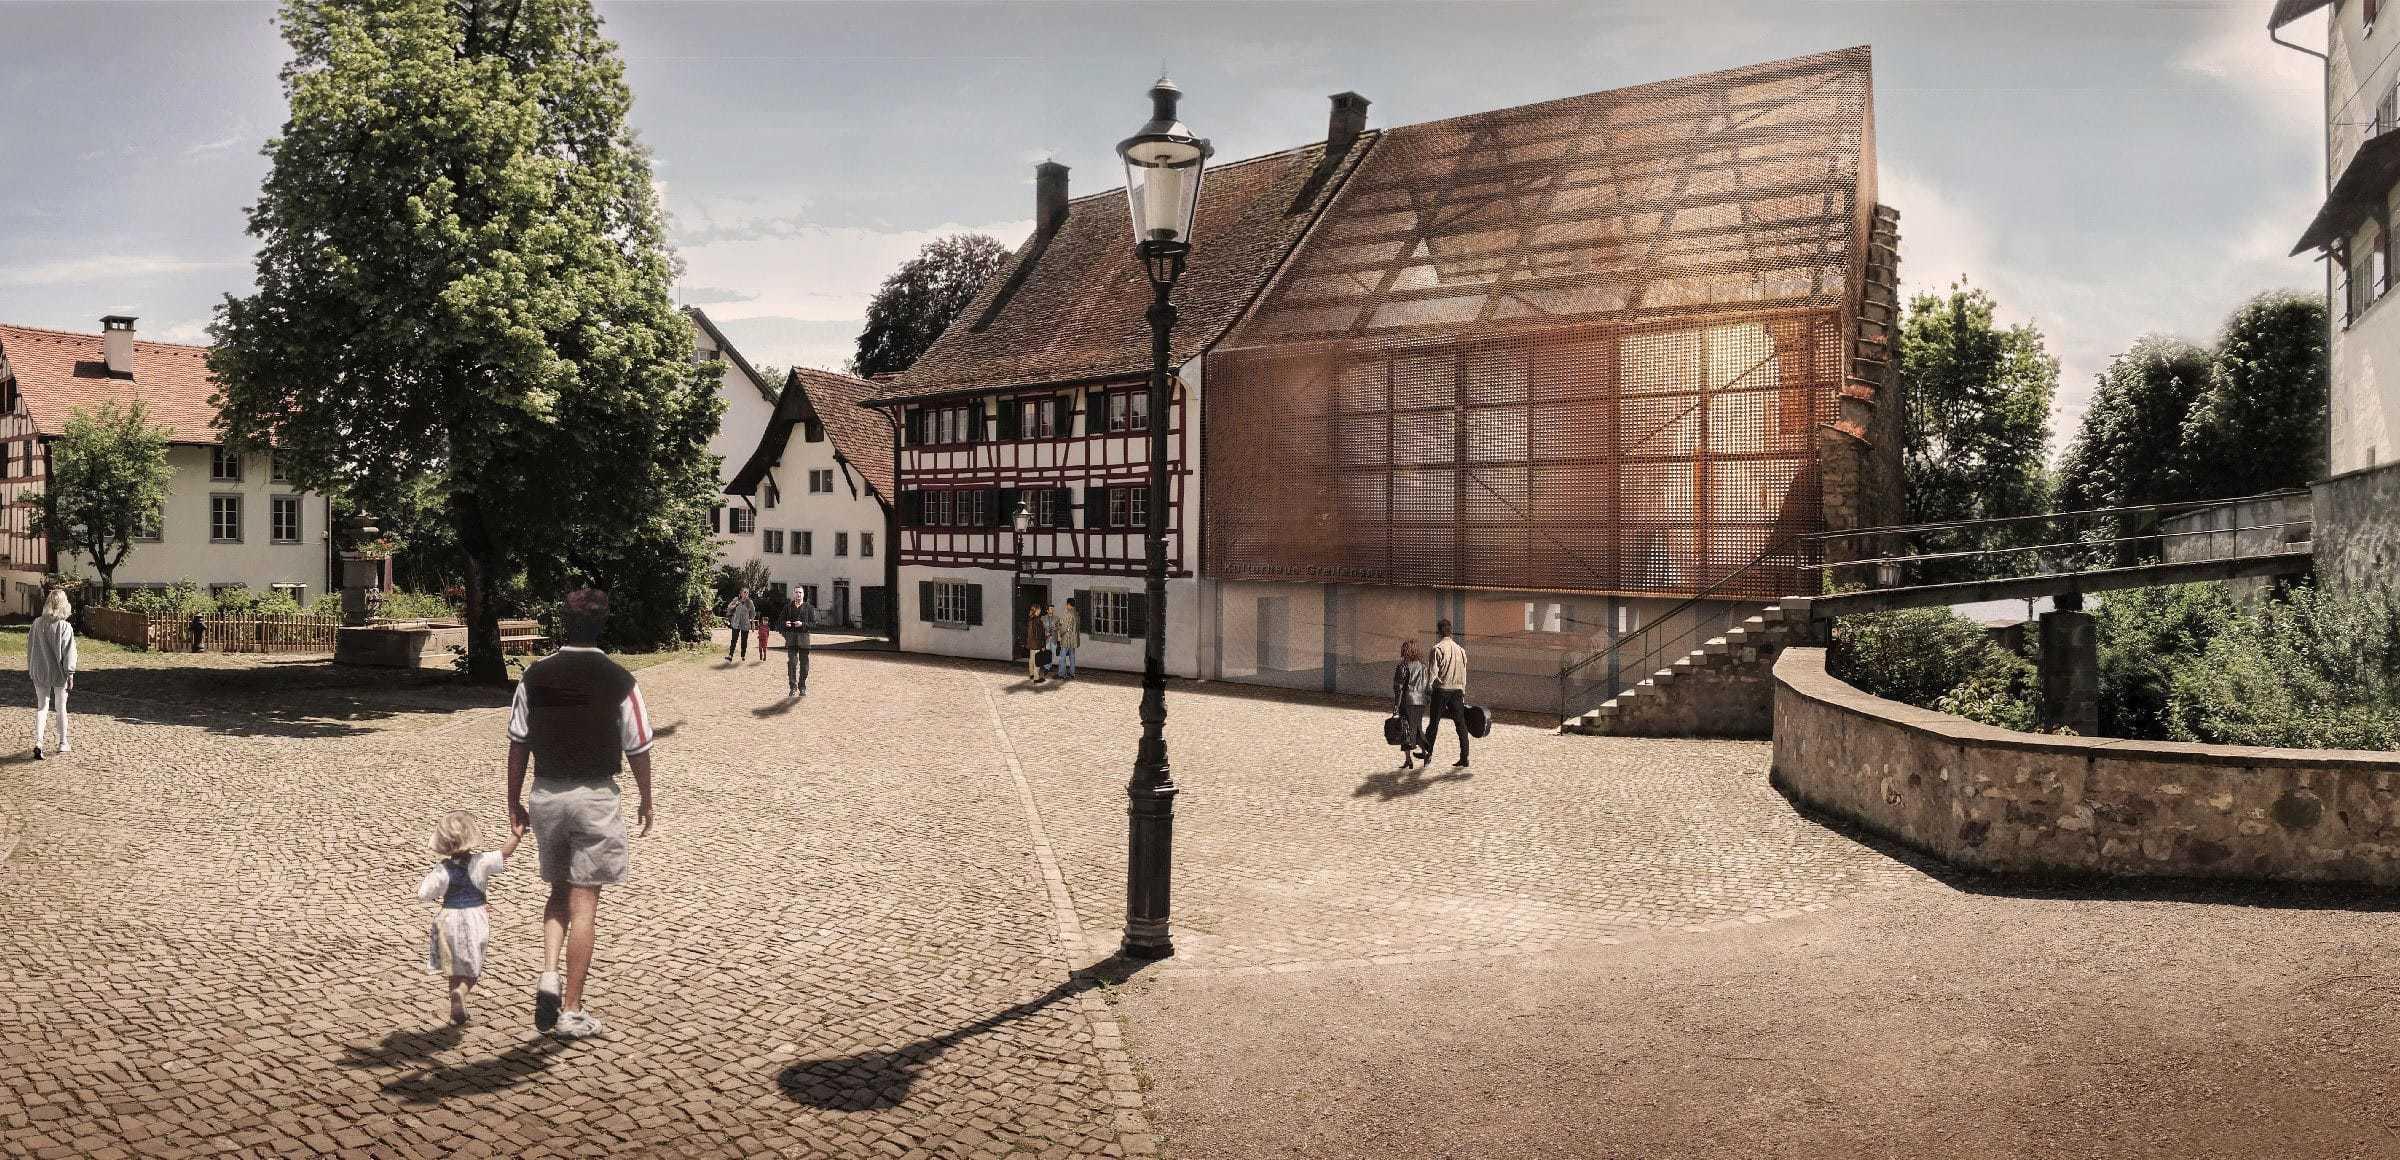 Landenberghaus Greifensee 02 2400X1160